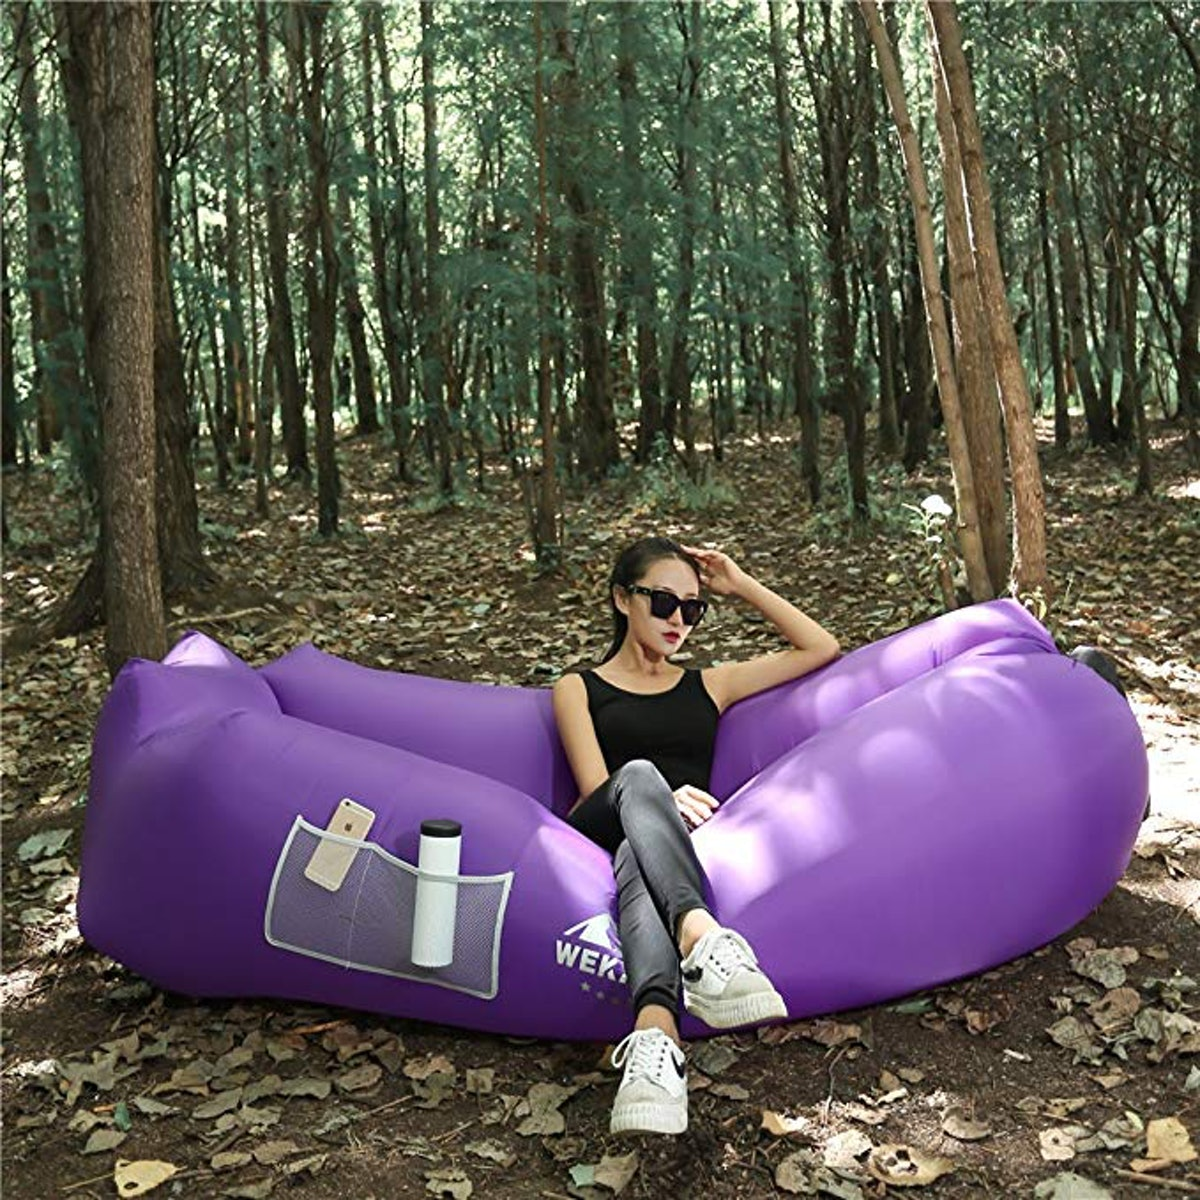 WEKAPO Inflatable Air Sofa Hammock-Portable